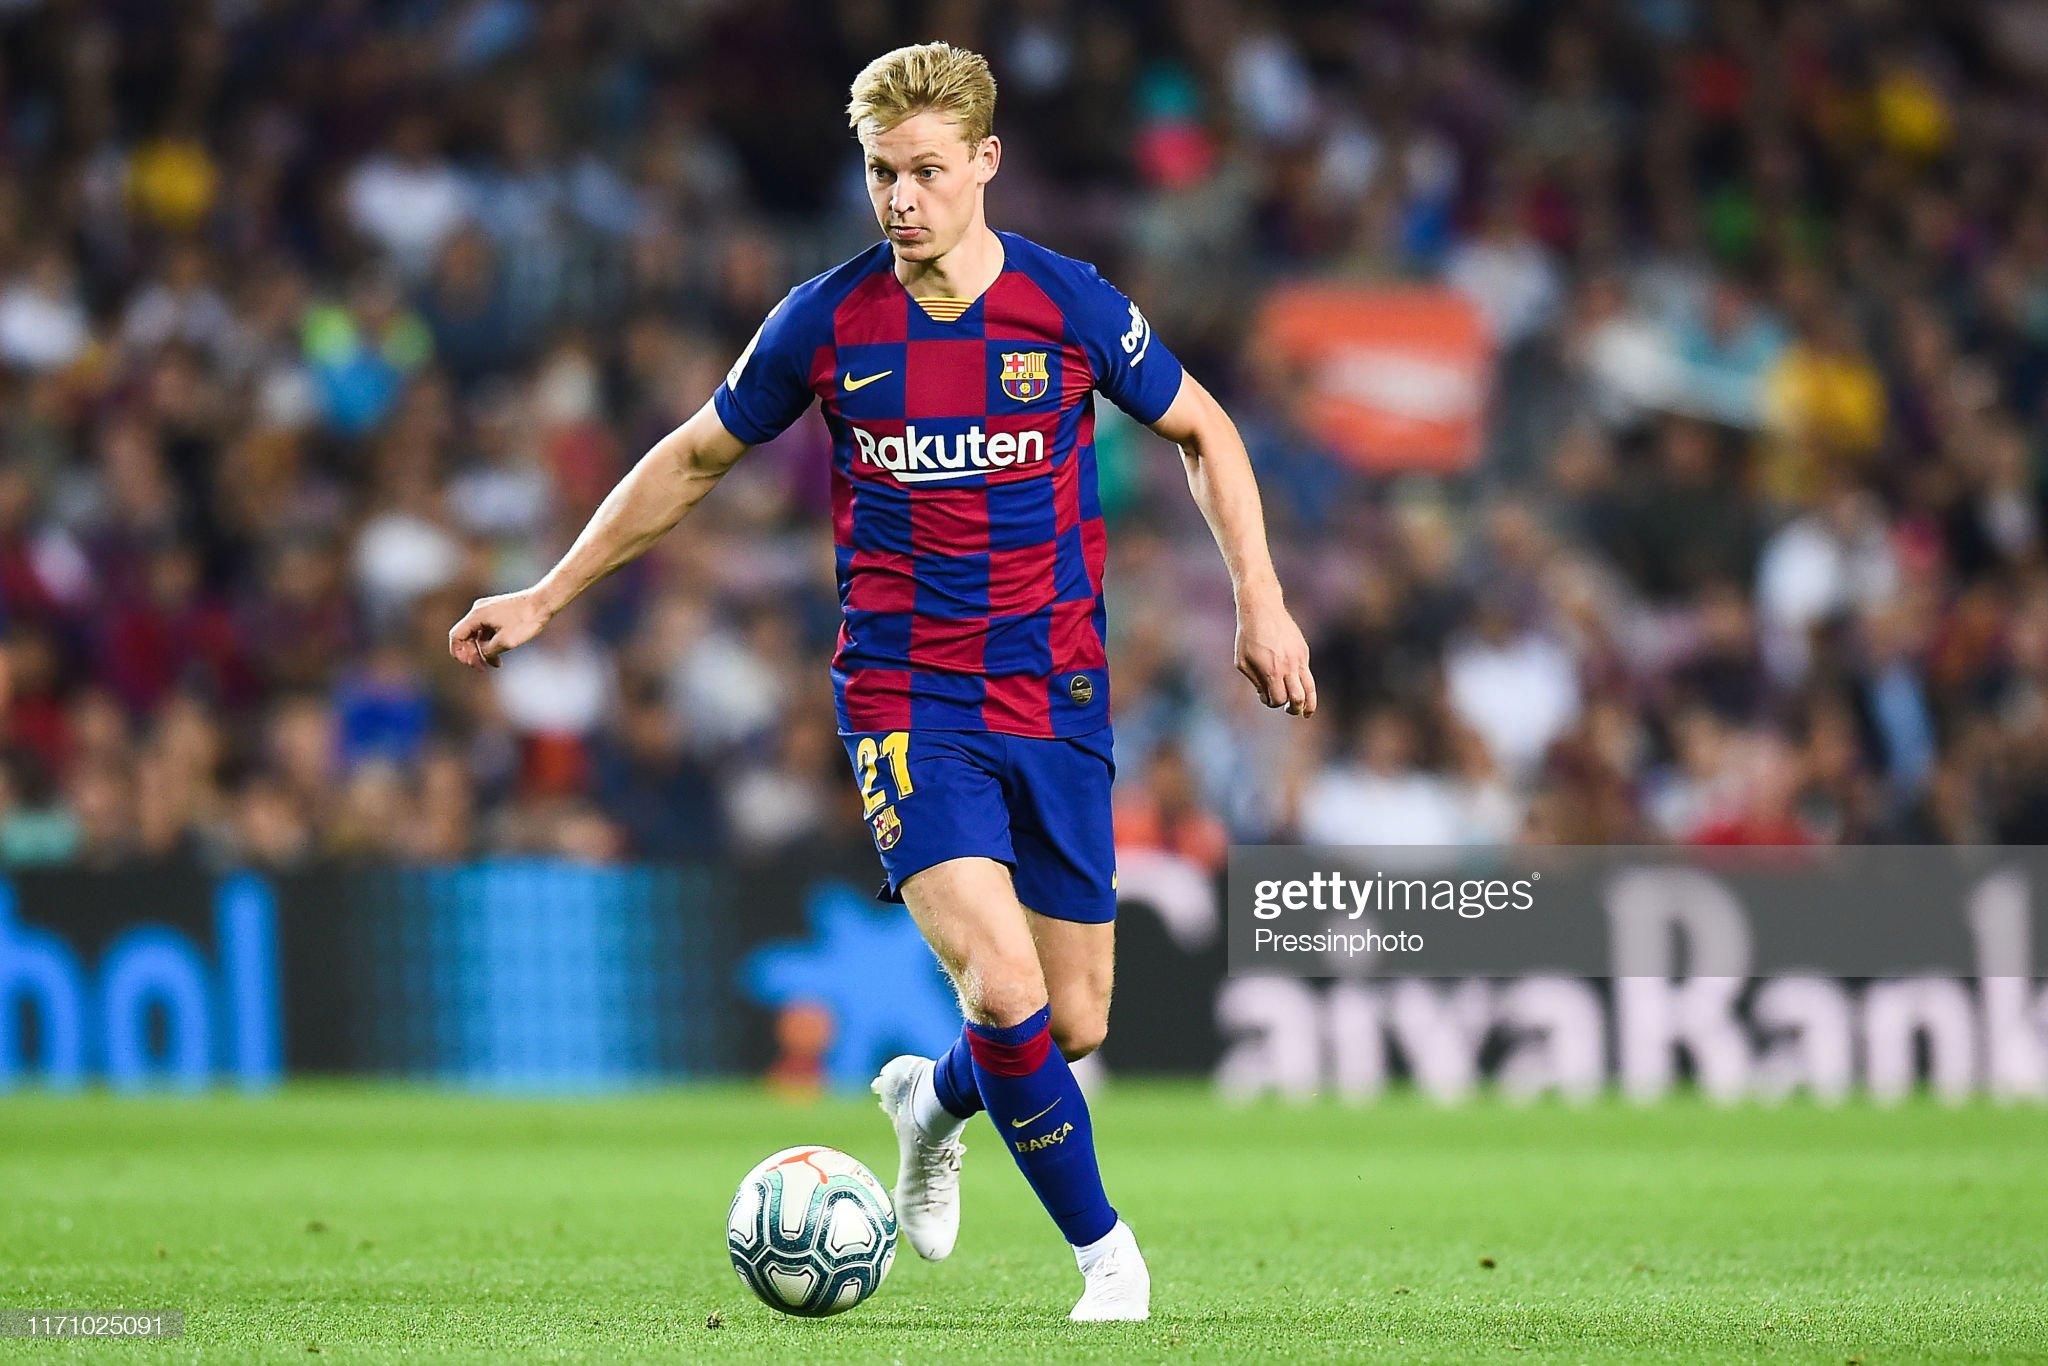 صور مباراة : برشلونة - فياريال 2-1 ( 24-09-2019 )  Frenkie-de-jong-of-fc-barcelona-during-the-liga-match-between-and-picture-id1171025091?s=2048x2048